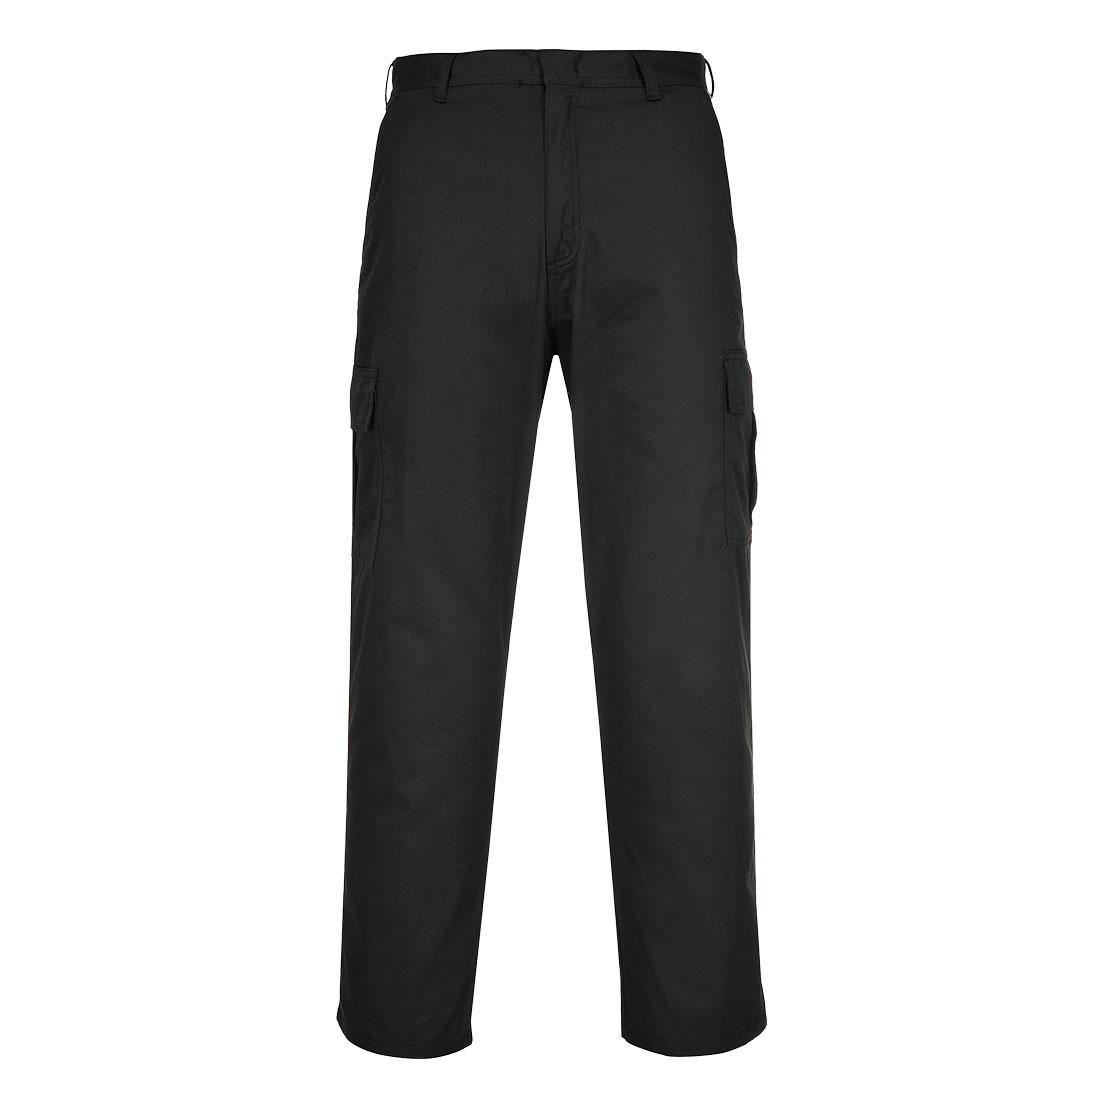 Combat Trousers Black 36R